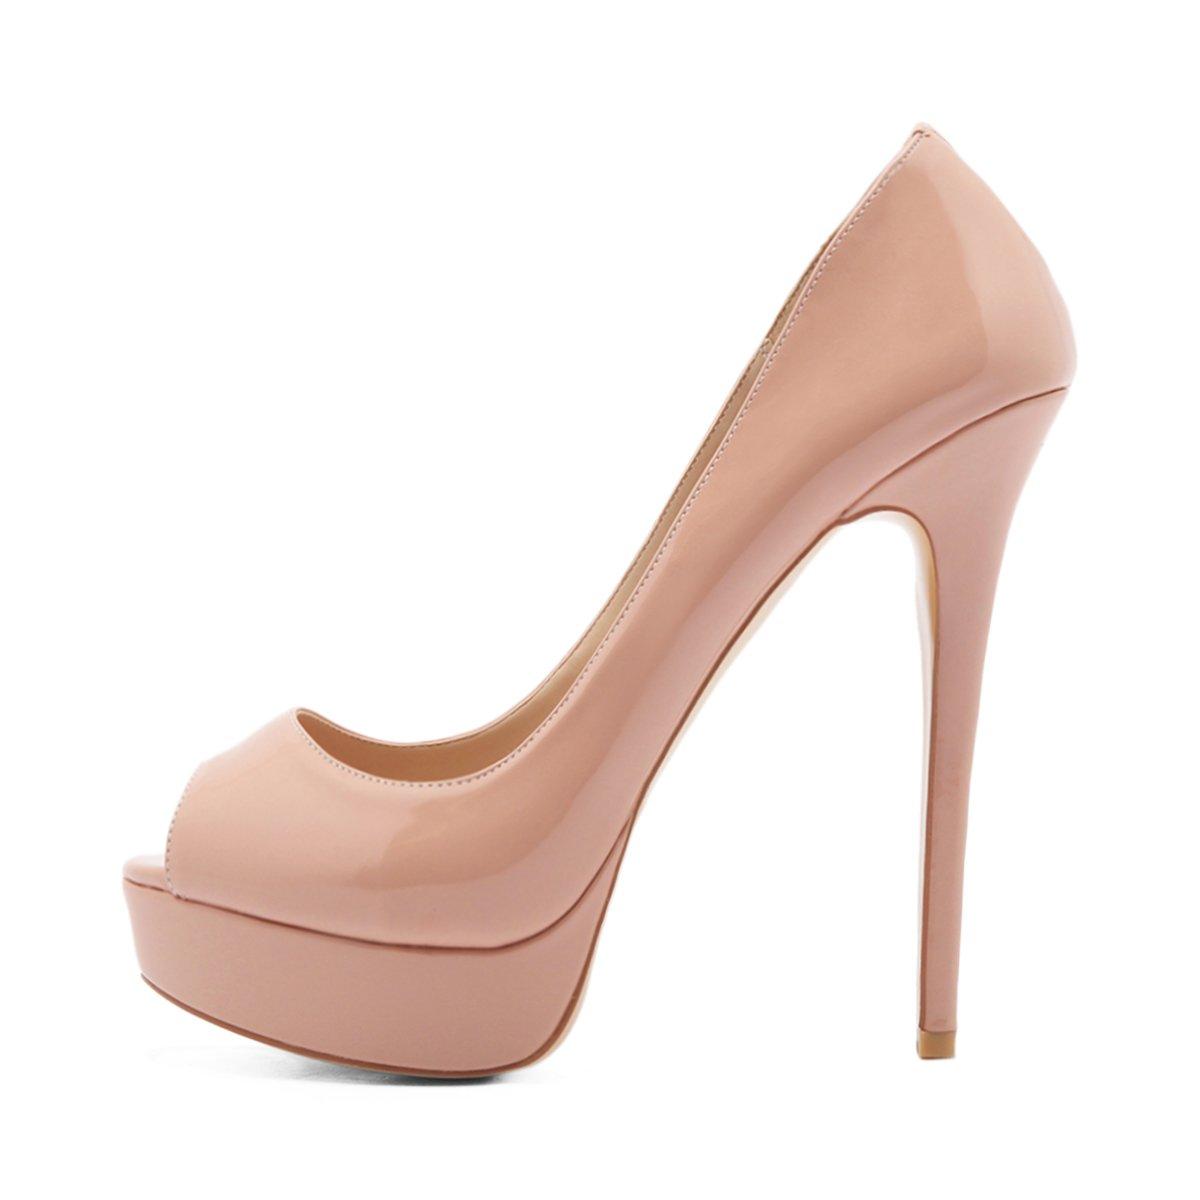 onlymaker Women's Sexy High Heels Peep Toe Slip On Platform Pumps Stiletto Dress Party Wedding Shoes Nude US9.5